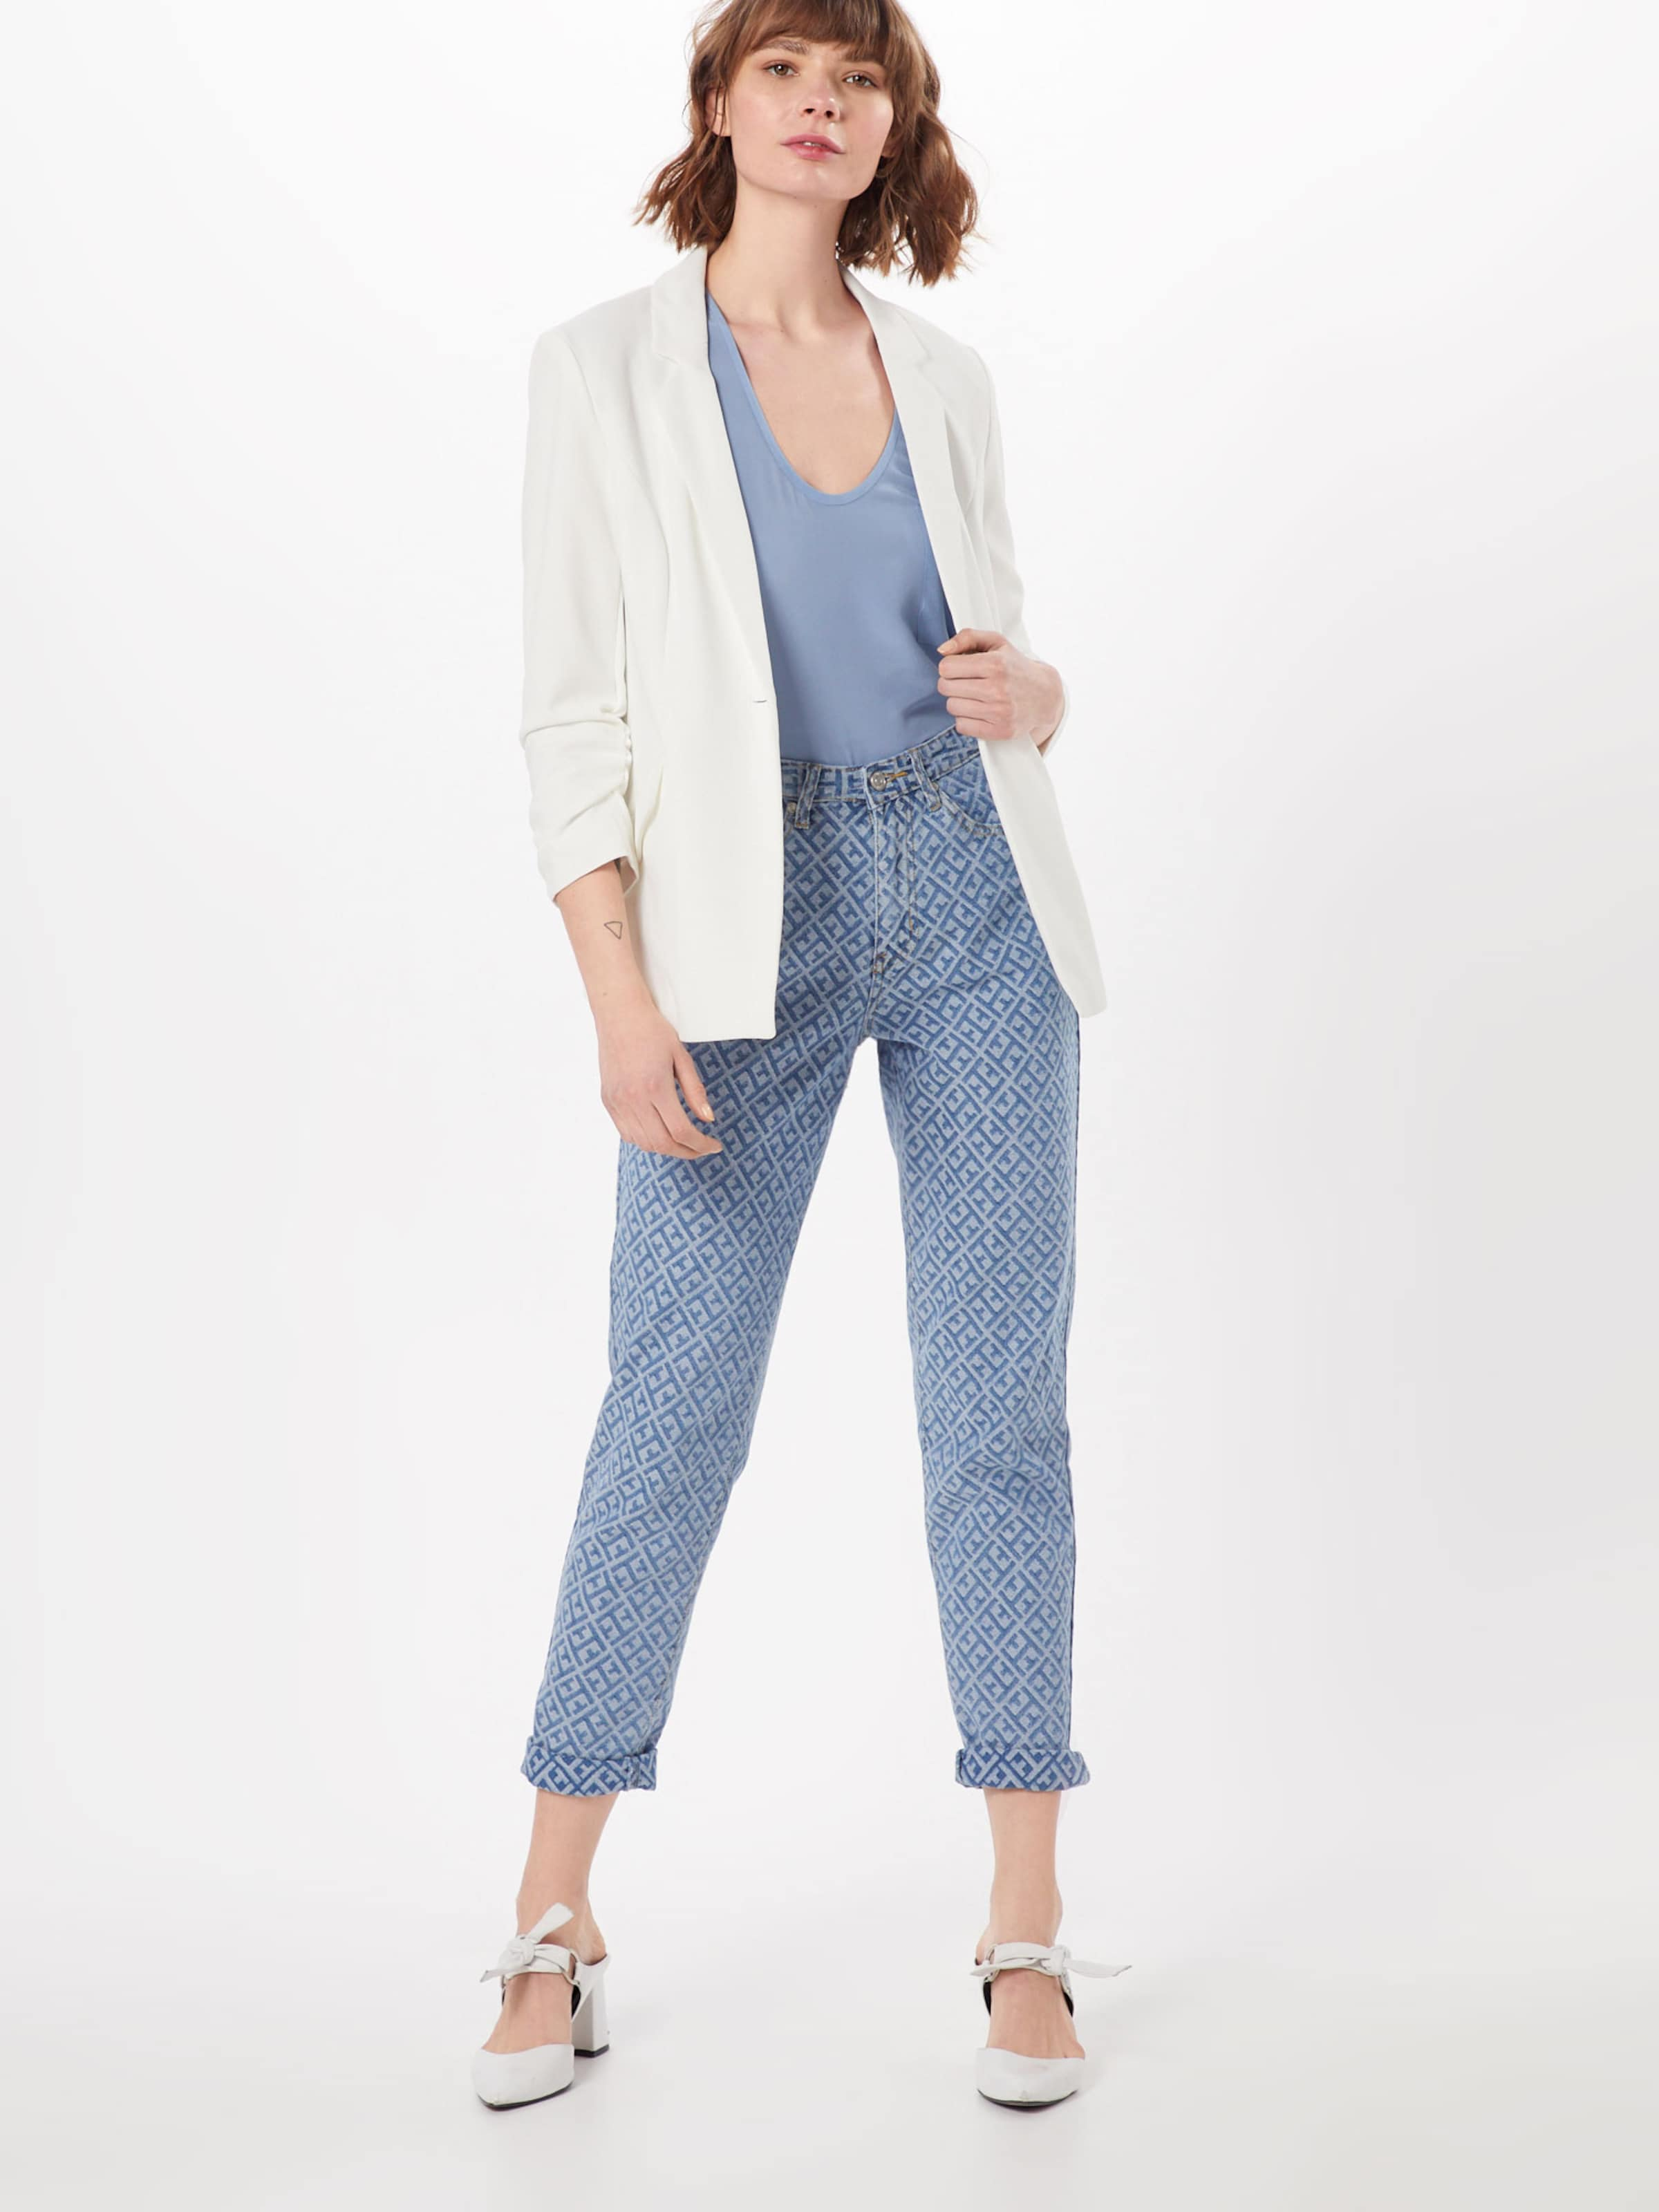 Missguided Hellblau Missguided Jeans Missguided Hellblau Hellblau In Missguided In Jeans In Jeans Jeans 0PNO8nwXZk